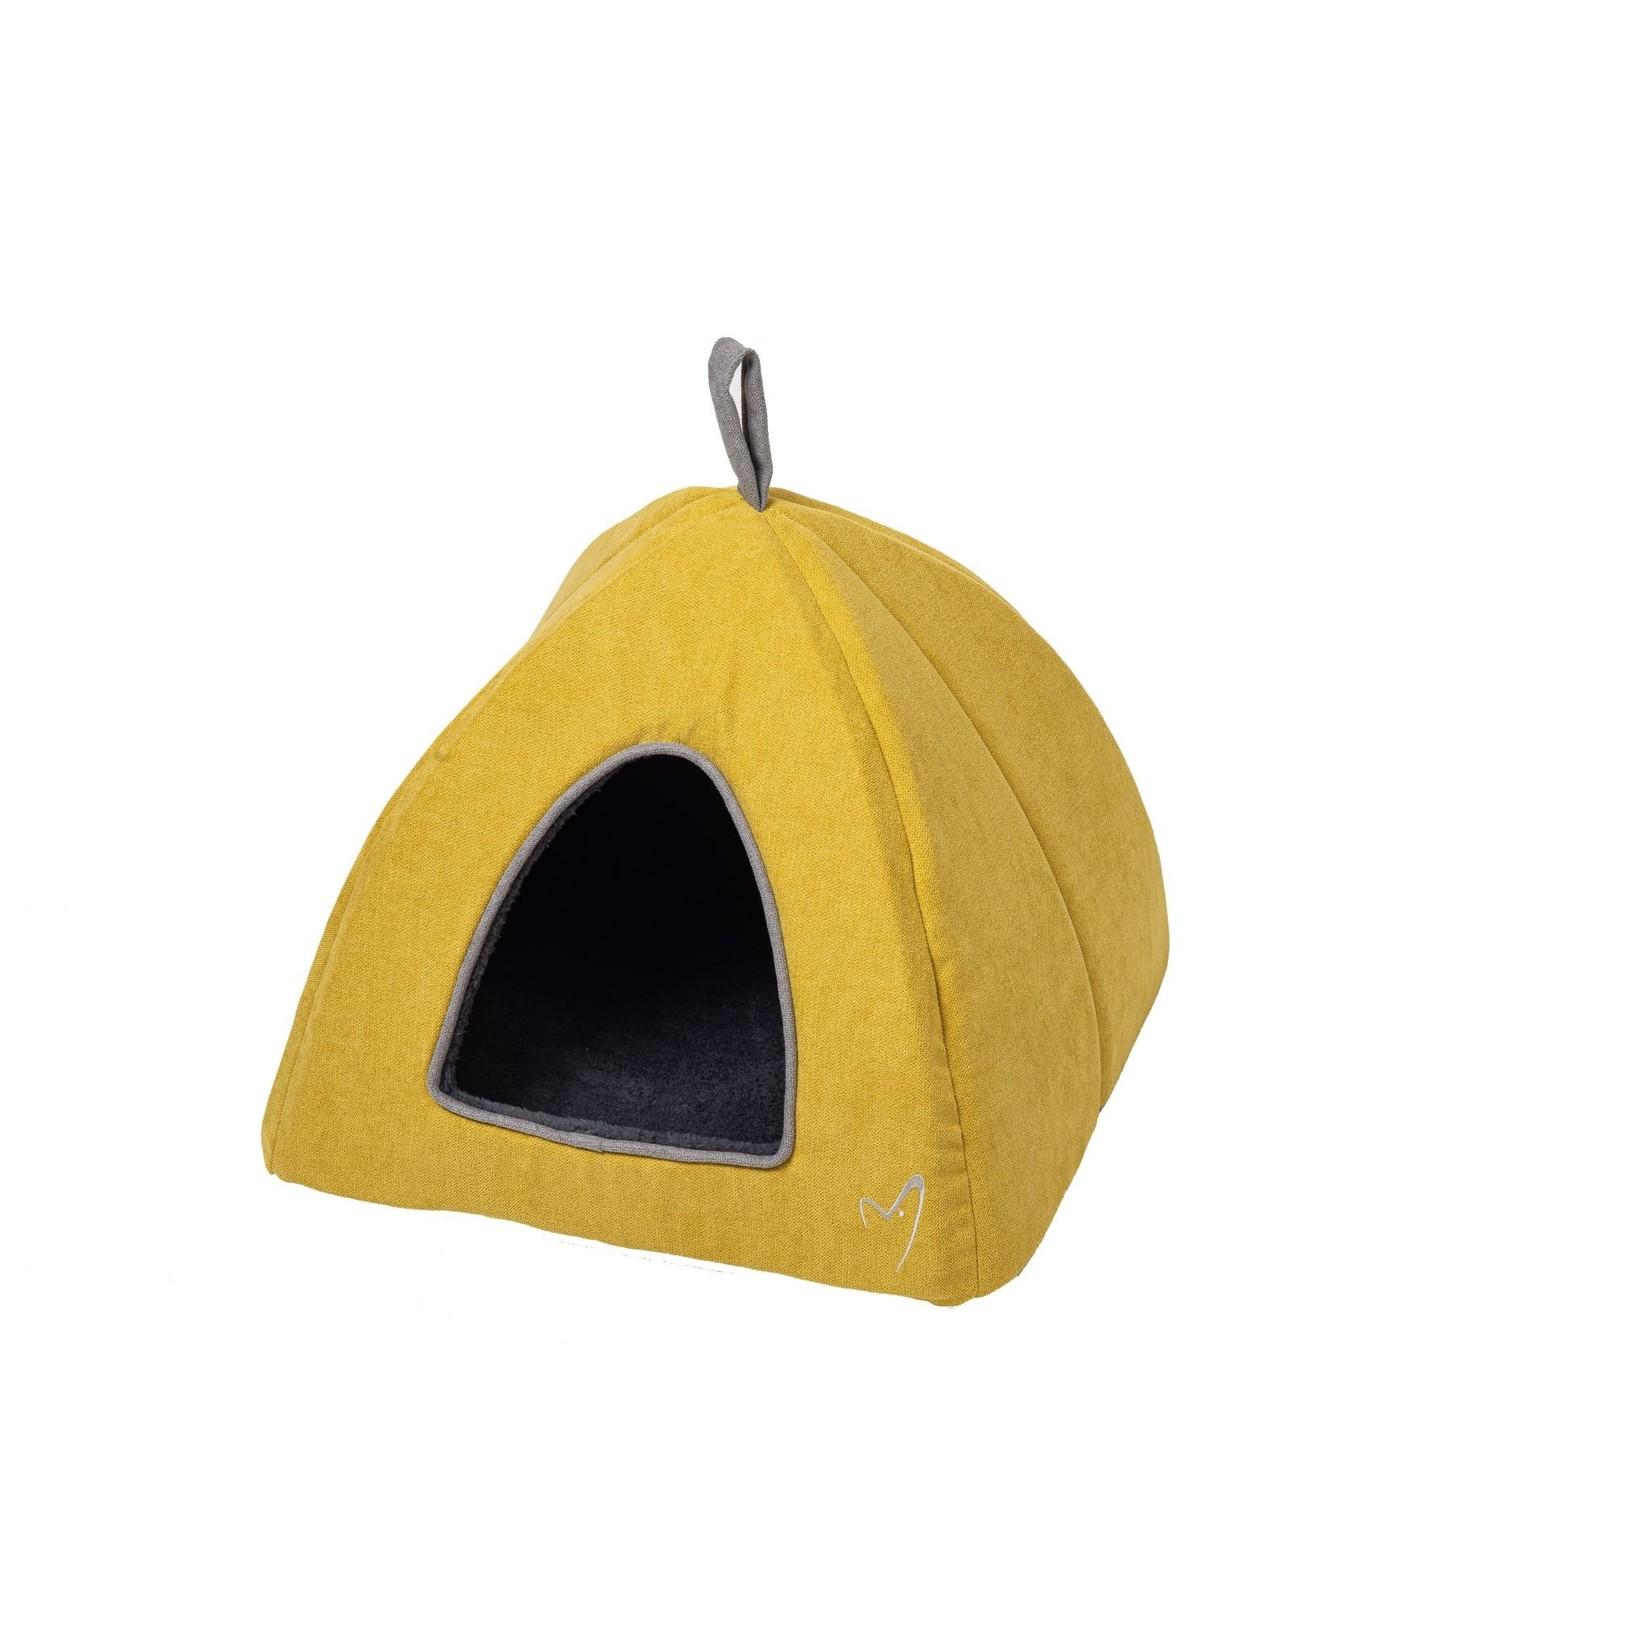 Gor Pets Camden Pyramid Cat Bed 40x40x40cm in Mustard***